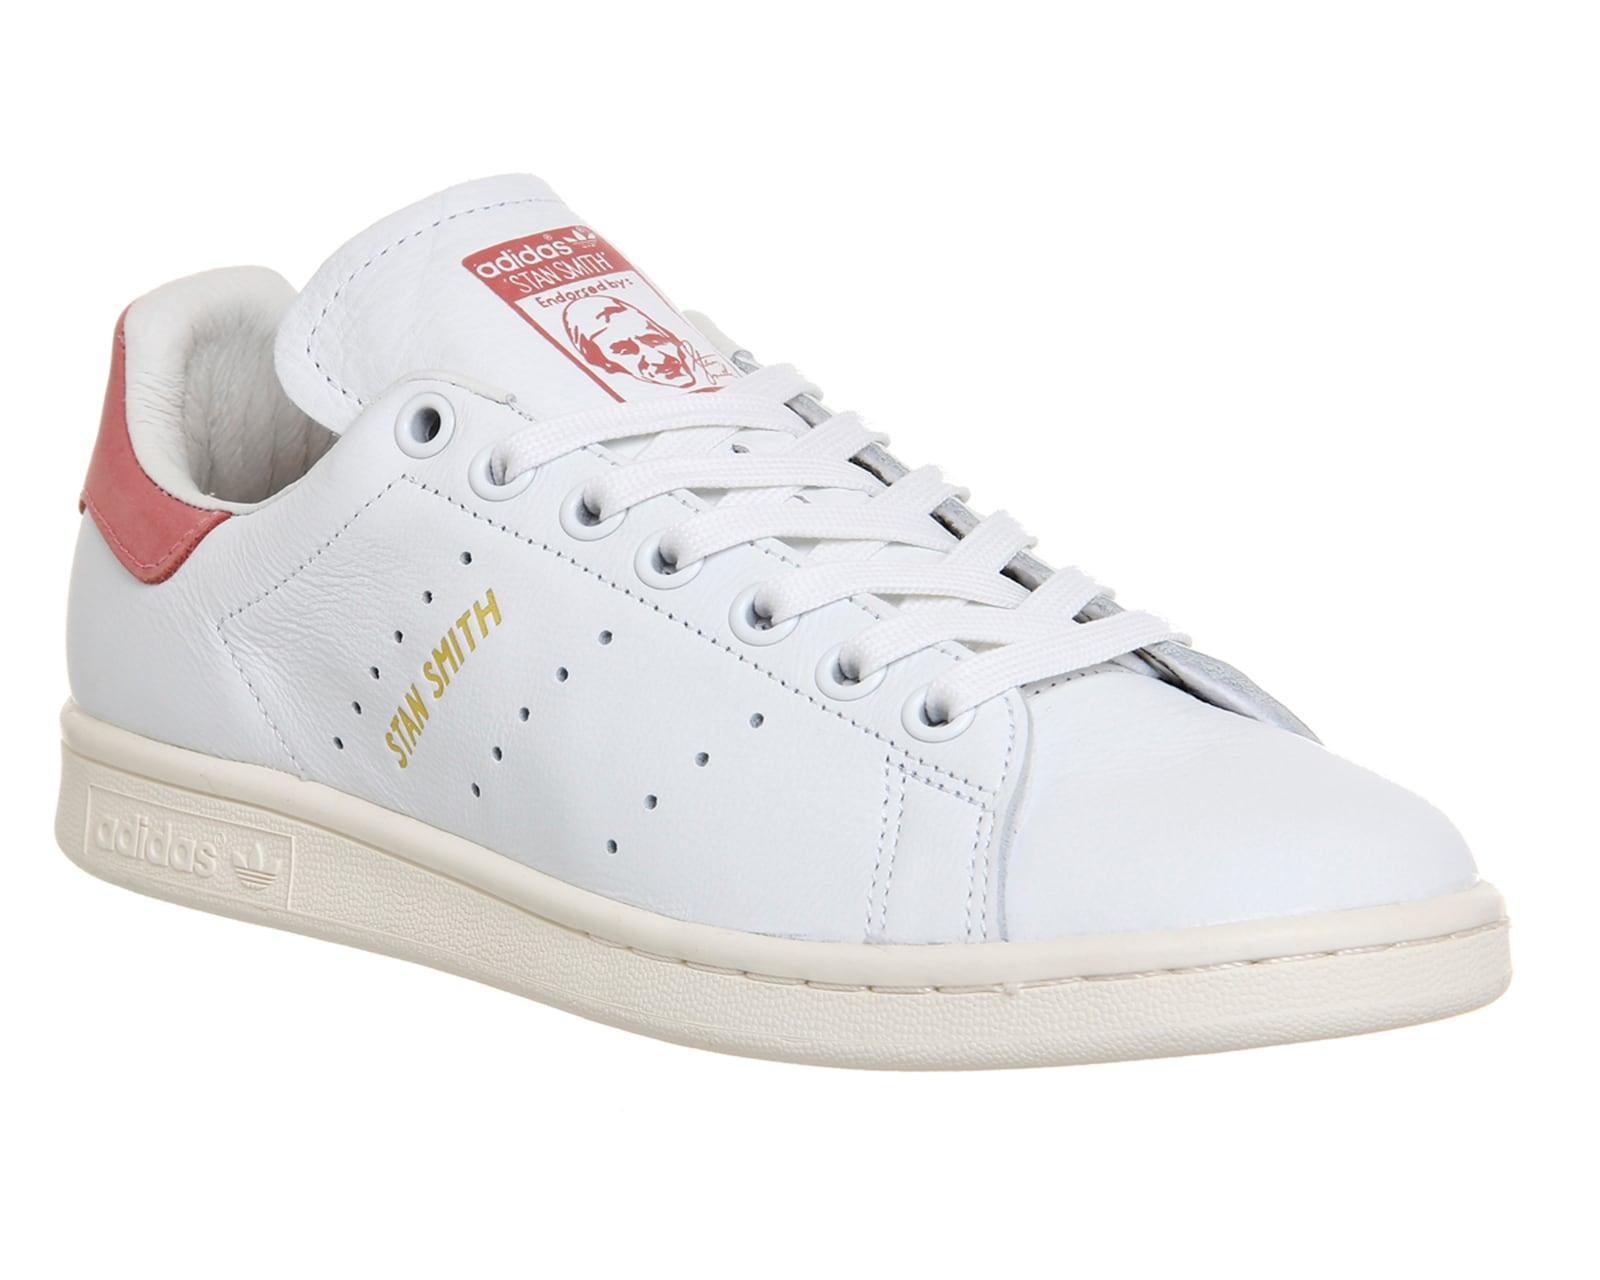 Adidas Stan Smith Bianco Rosa